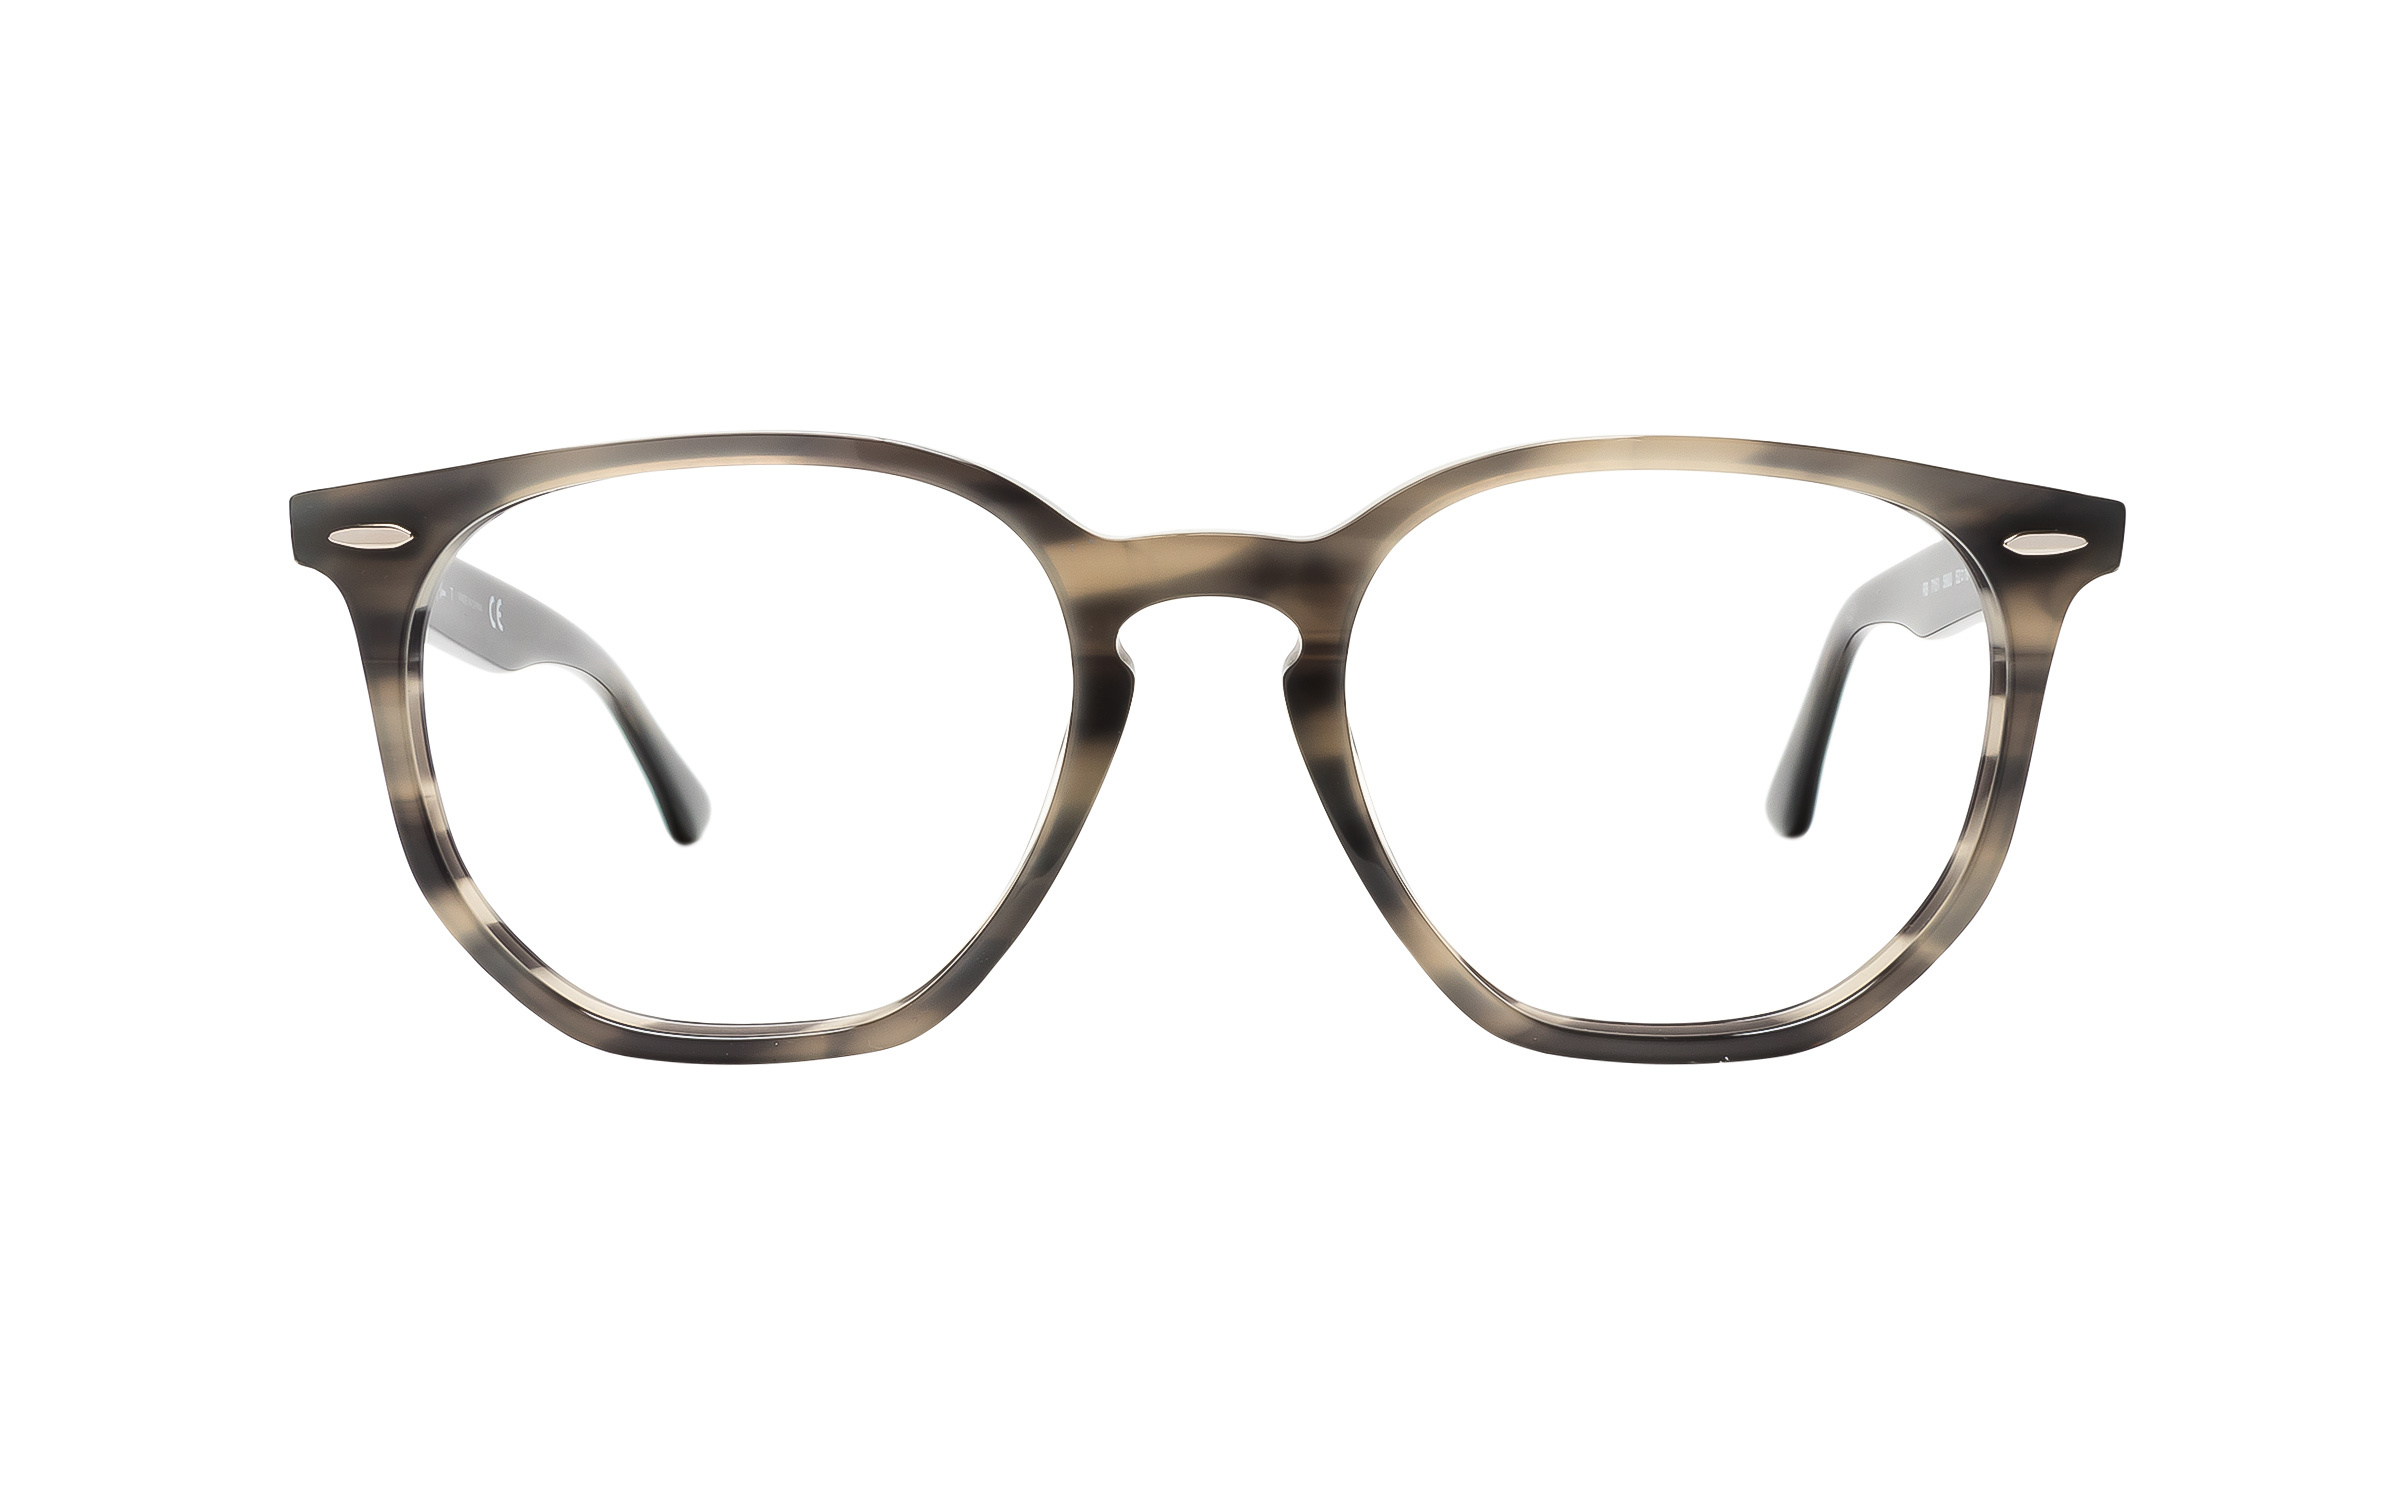 Luxottica Ray-Ban Hexagonal RX7151 5800 (52) Eyeglasses and Frame in Grey/Tortoise | Metal - Online Coastal